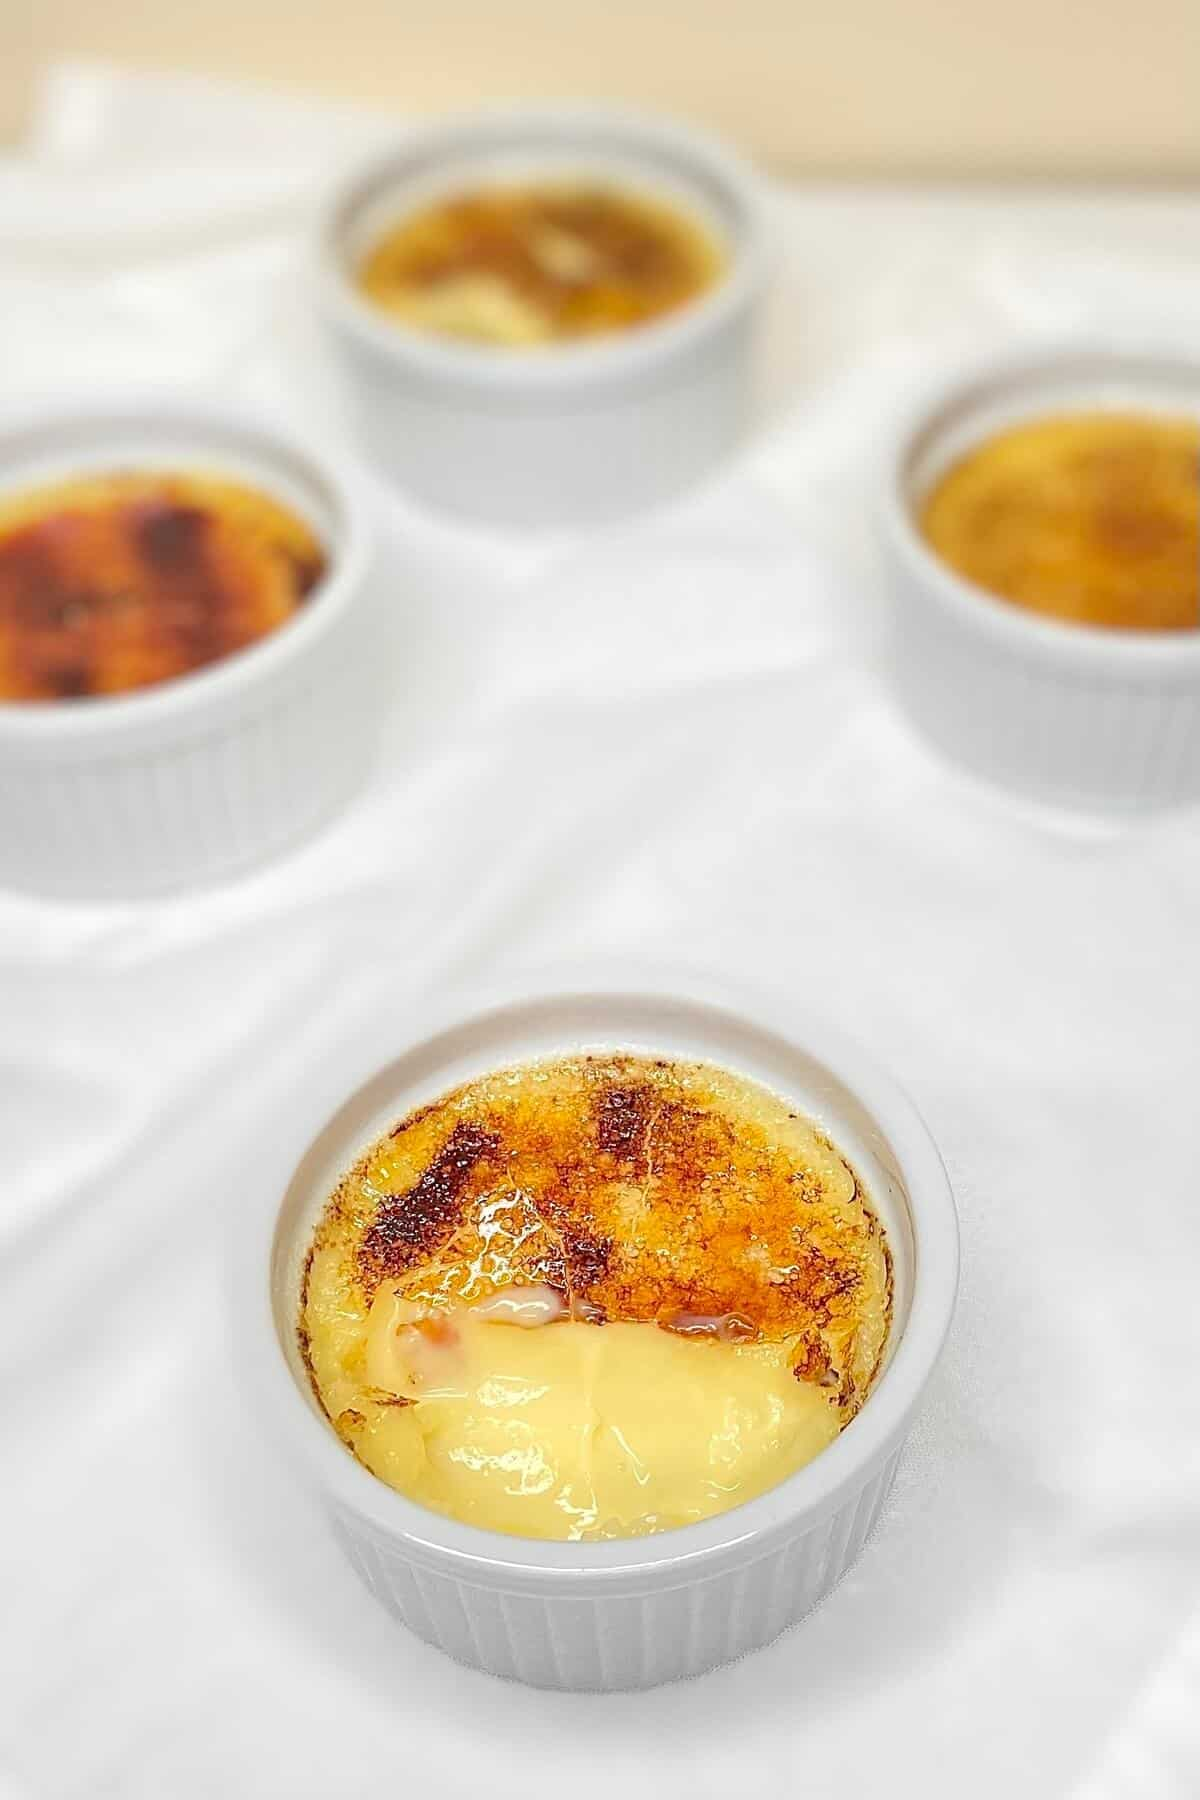 Creme brulee (Photo by Viana Boenzli)